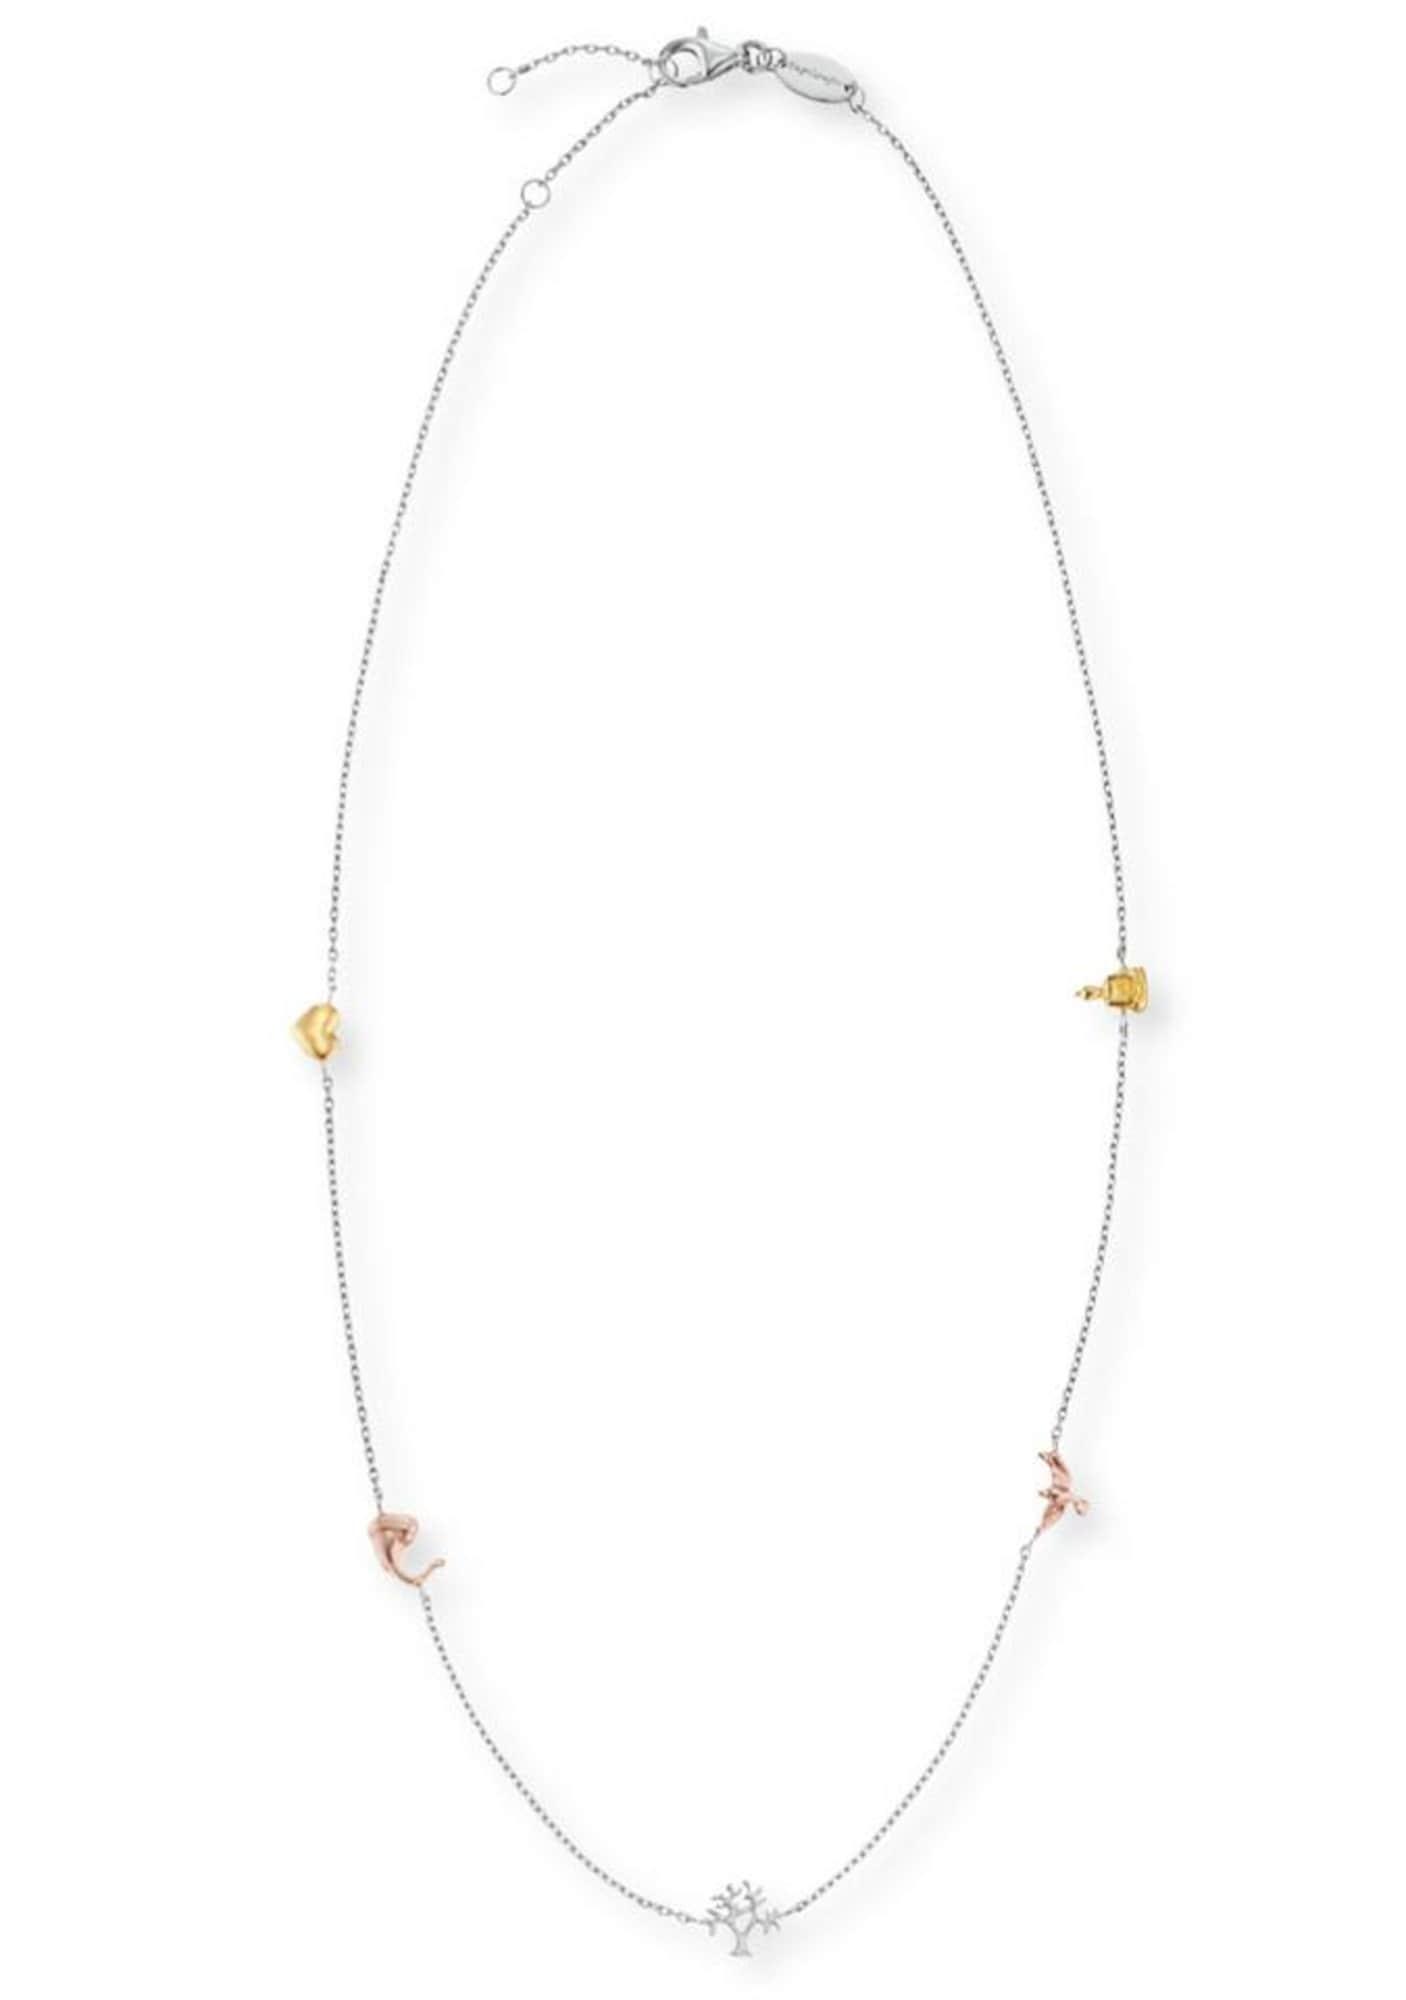 Silberkette | Schmuck > Halsketten > Silberketten | Silber | Engelsrufer